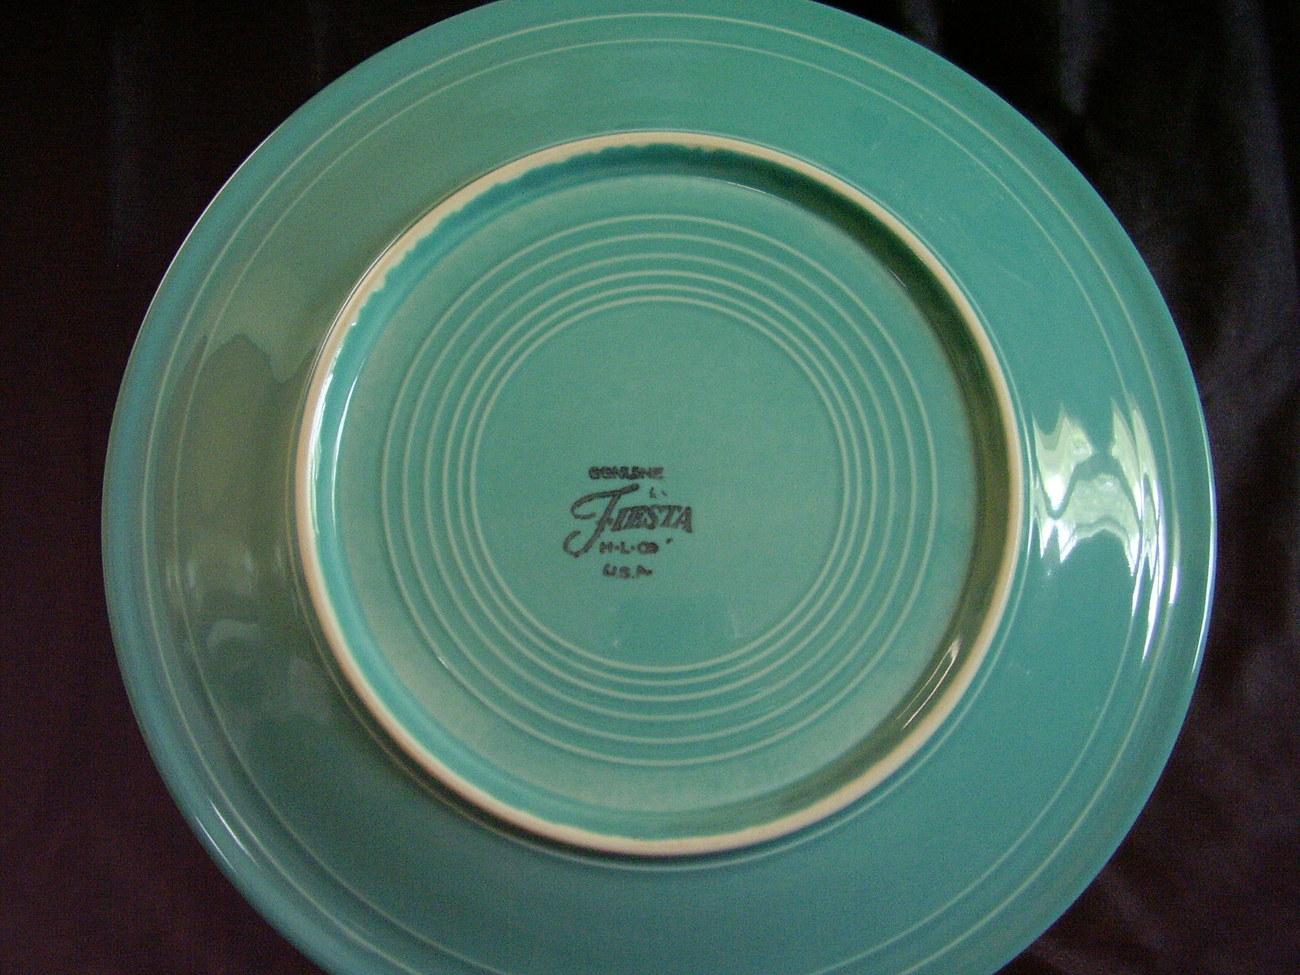 Fiesta Turquoise Dinner Plate C604 Contemporary Fiestaware